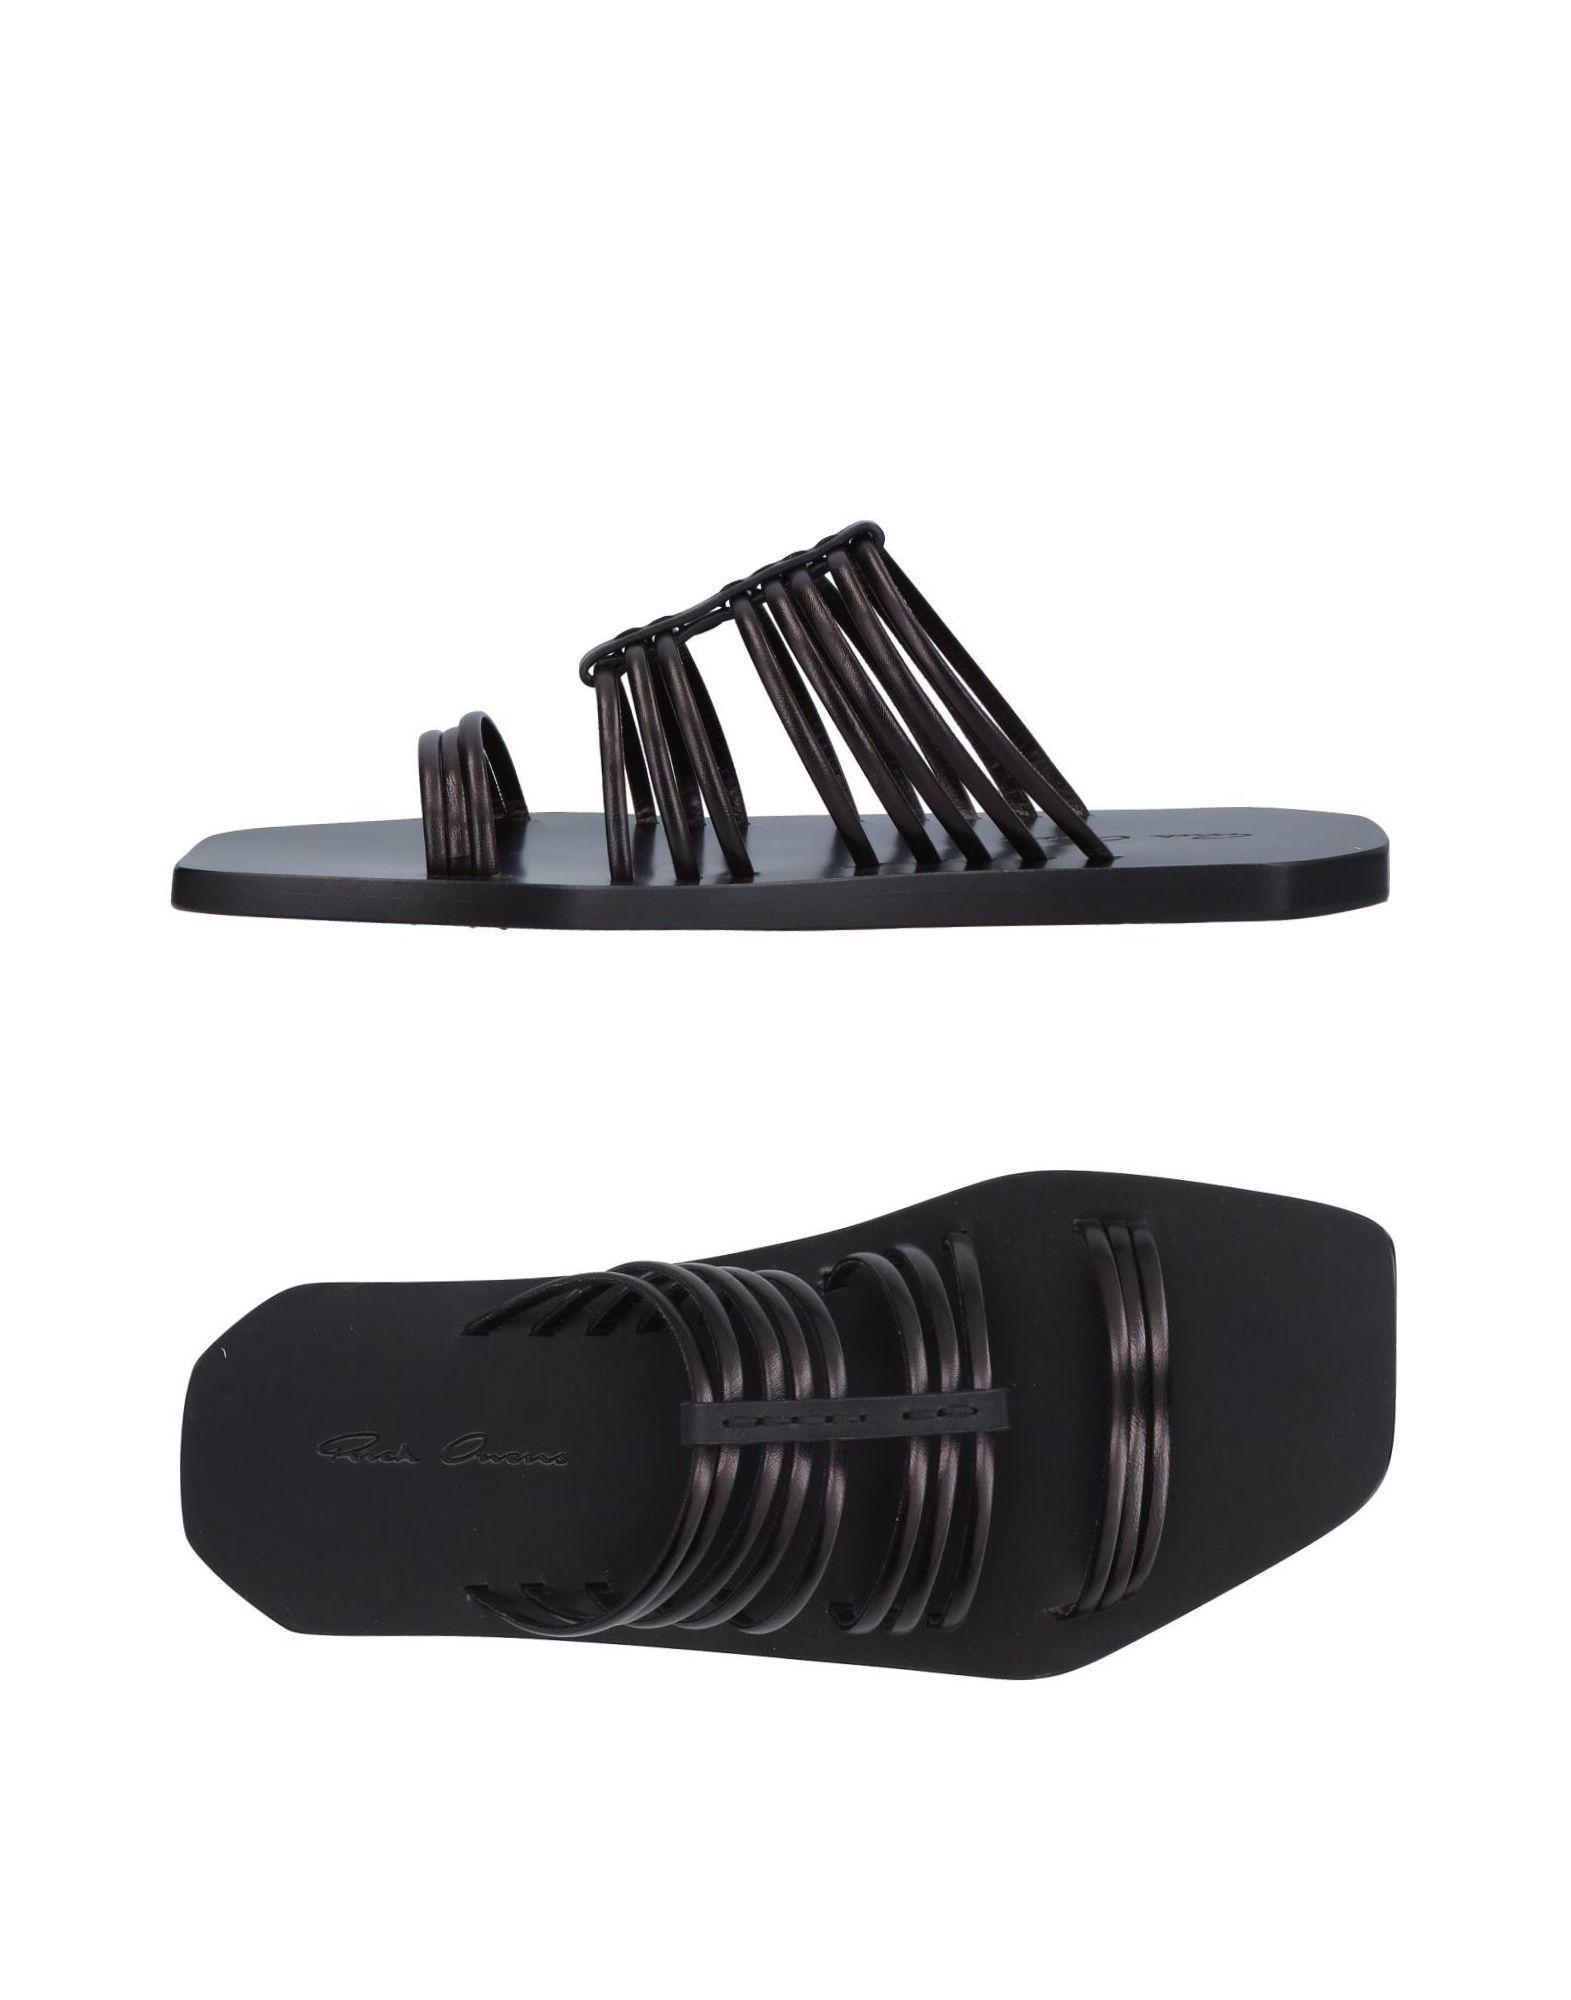 154ed328b235a0 Lyst - Rick Owens Sandals in Black